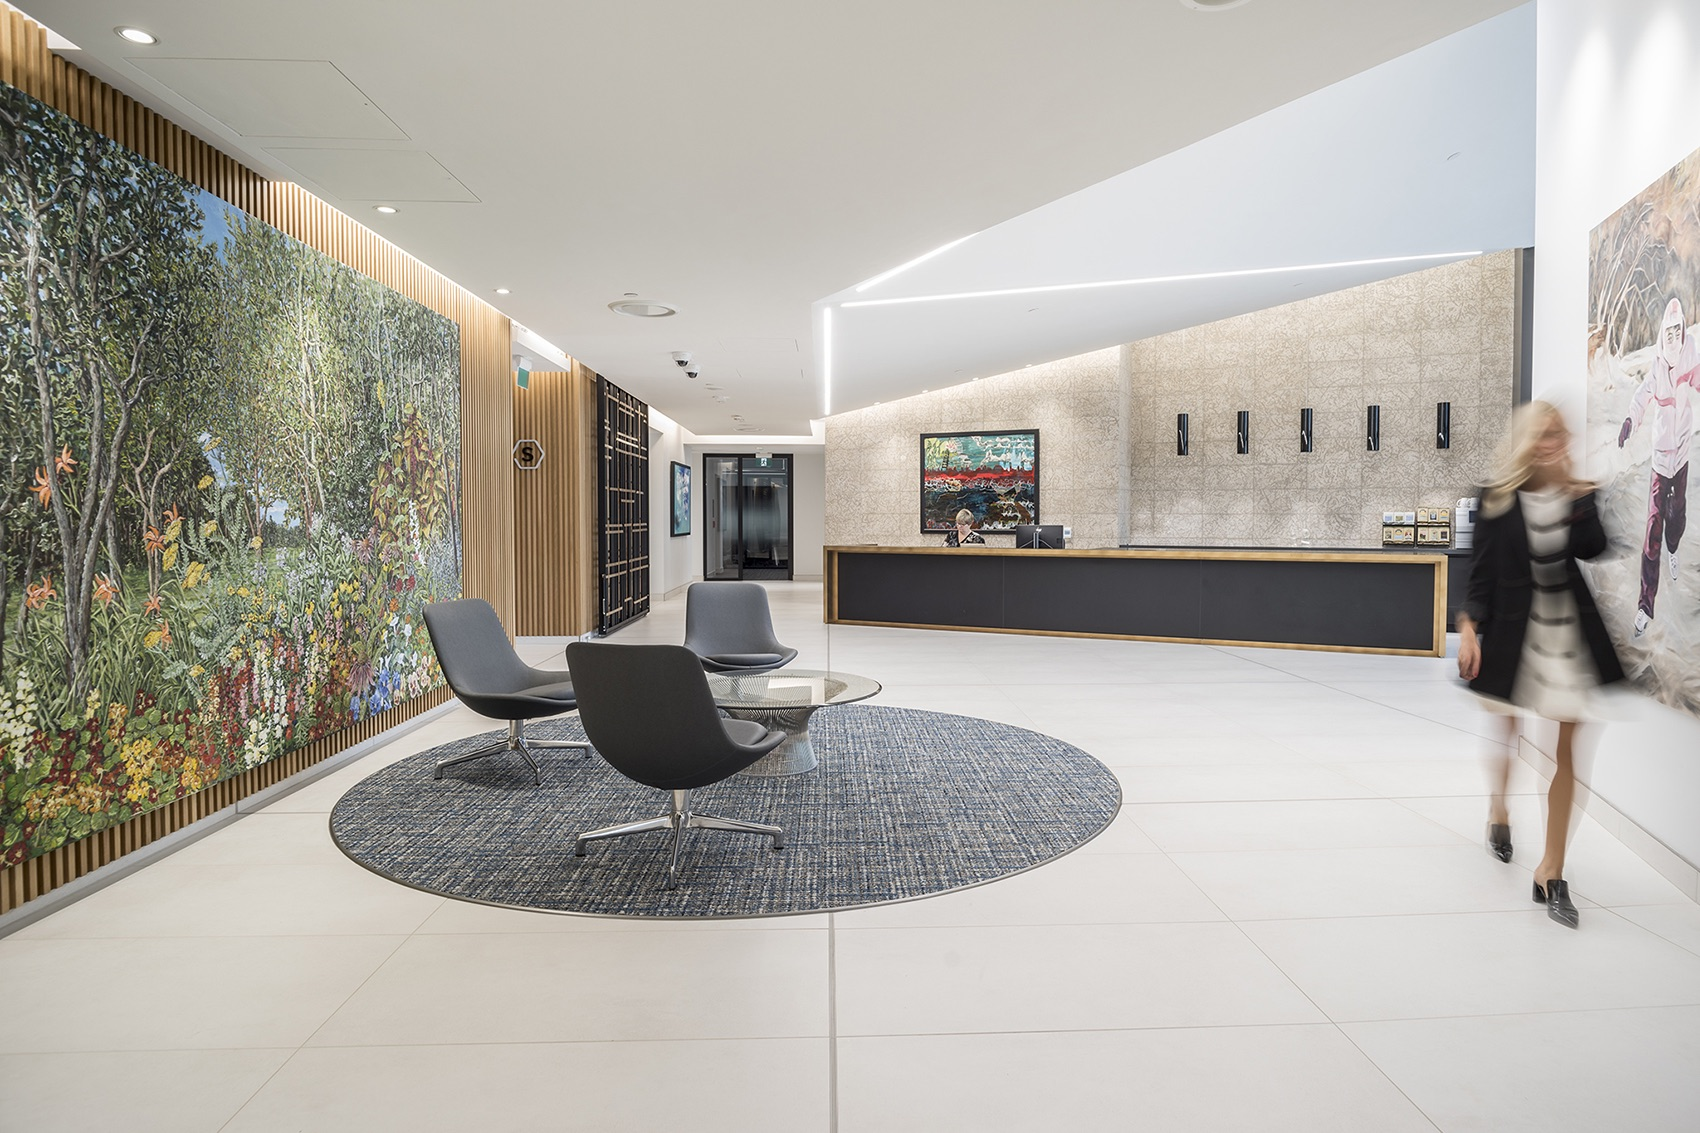 tds-winnipeg-office-4